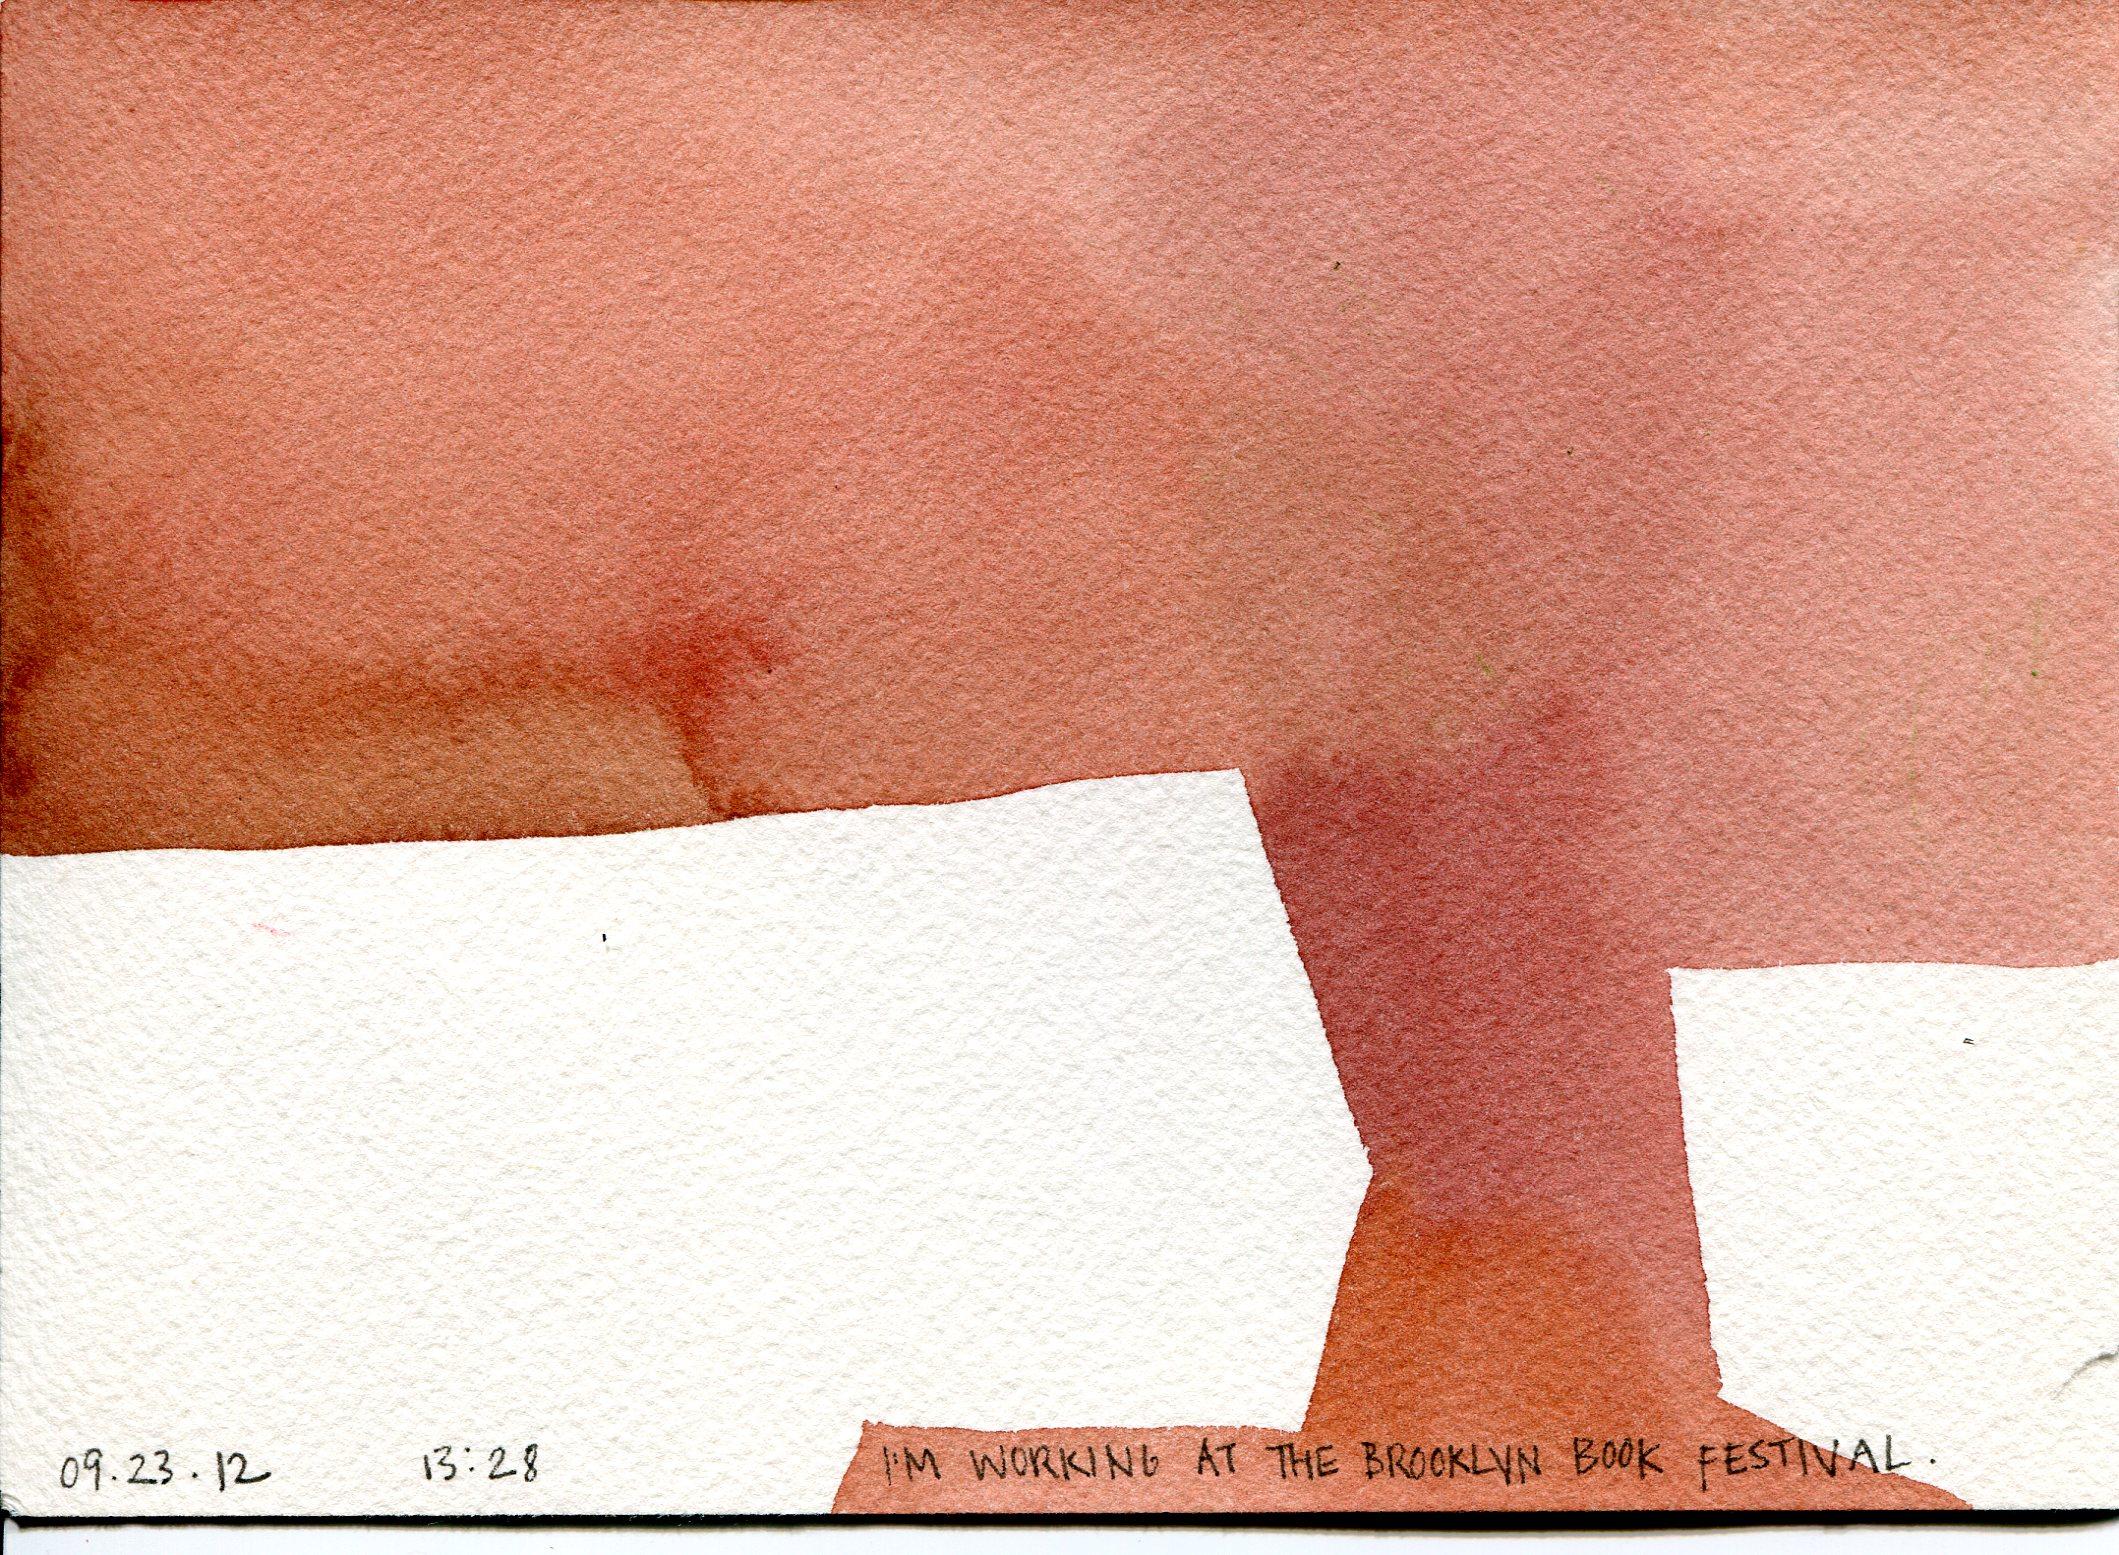 2012-09-23 drawing008.jpg